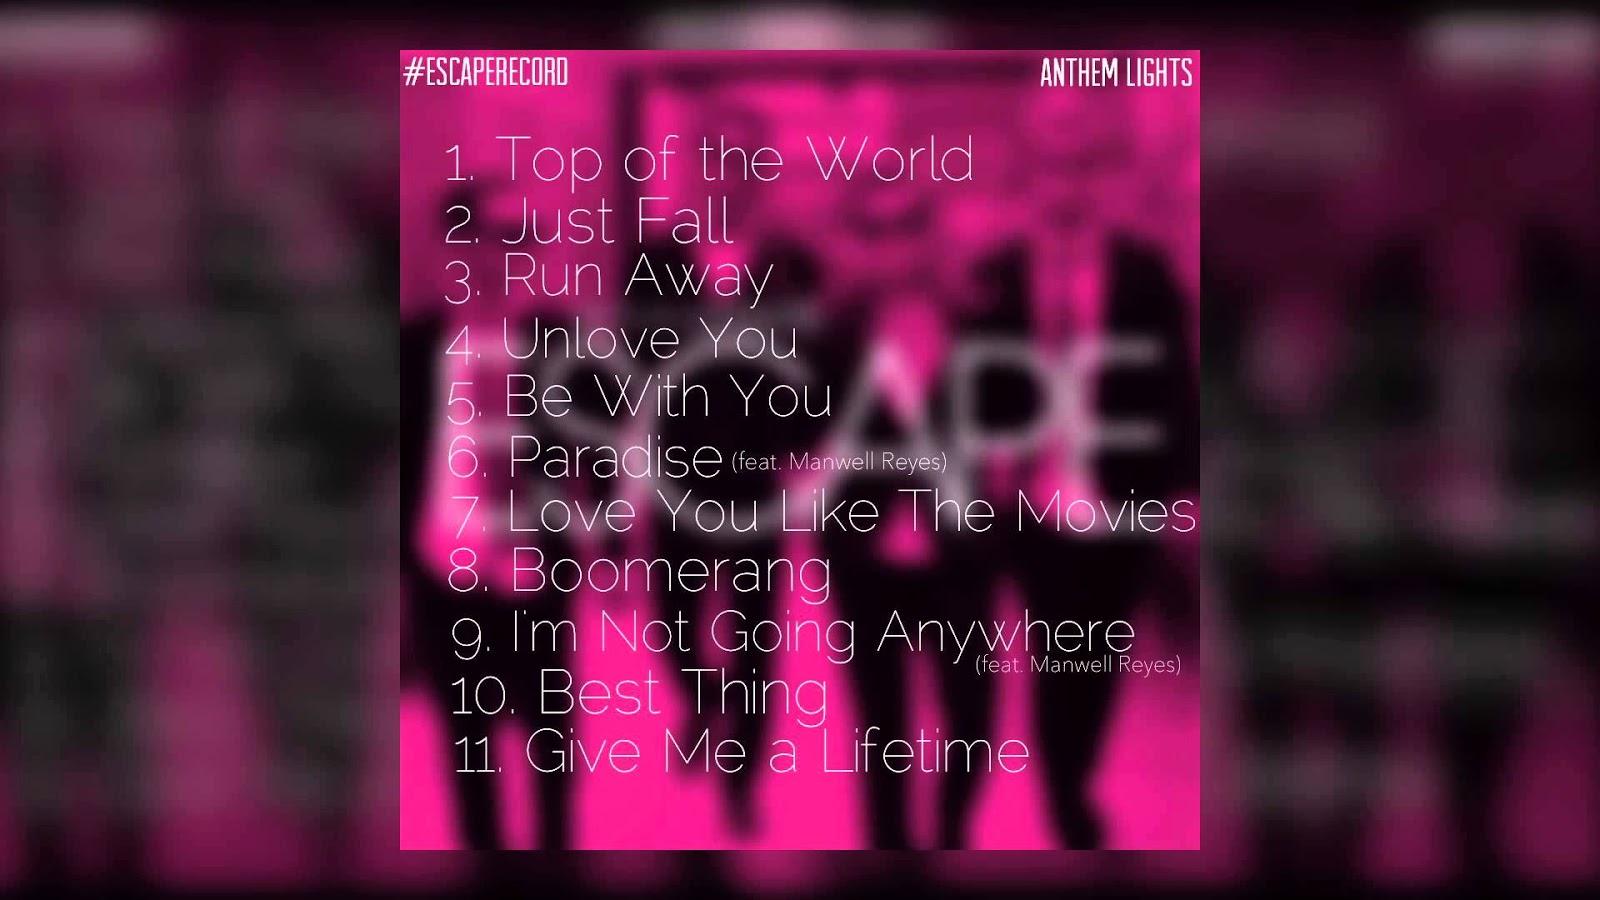 Anthem_Lights_-_Escape_Album_Tracklist_2014